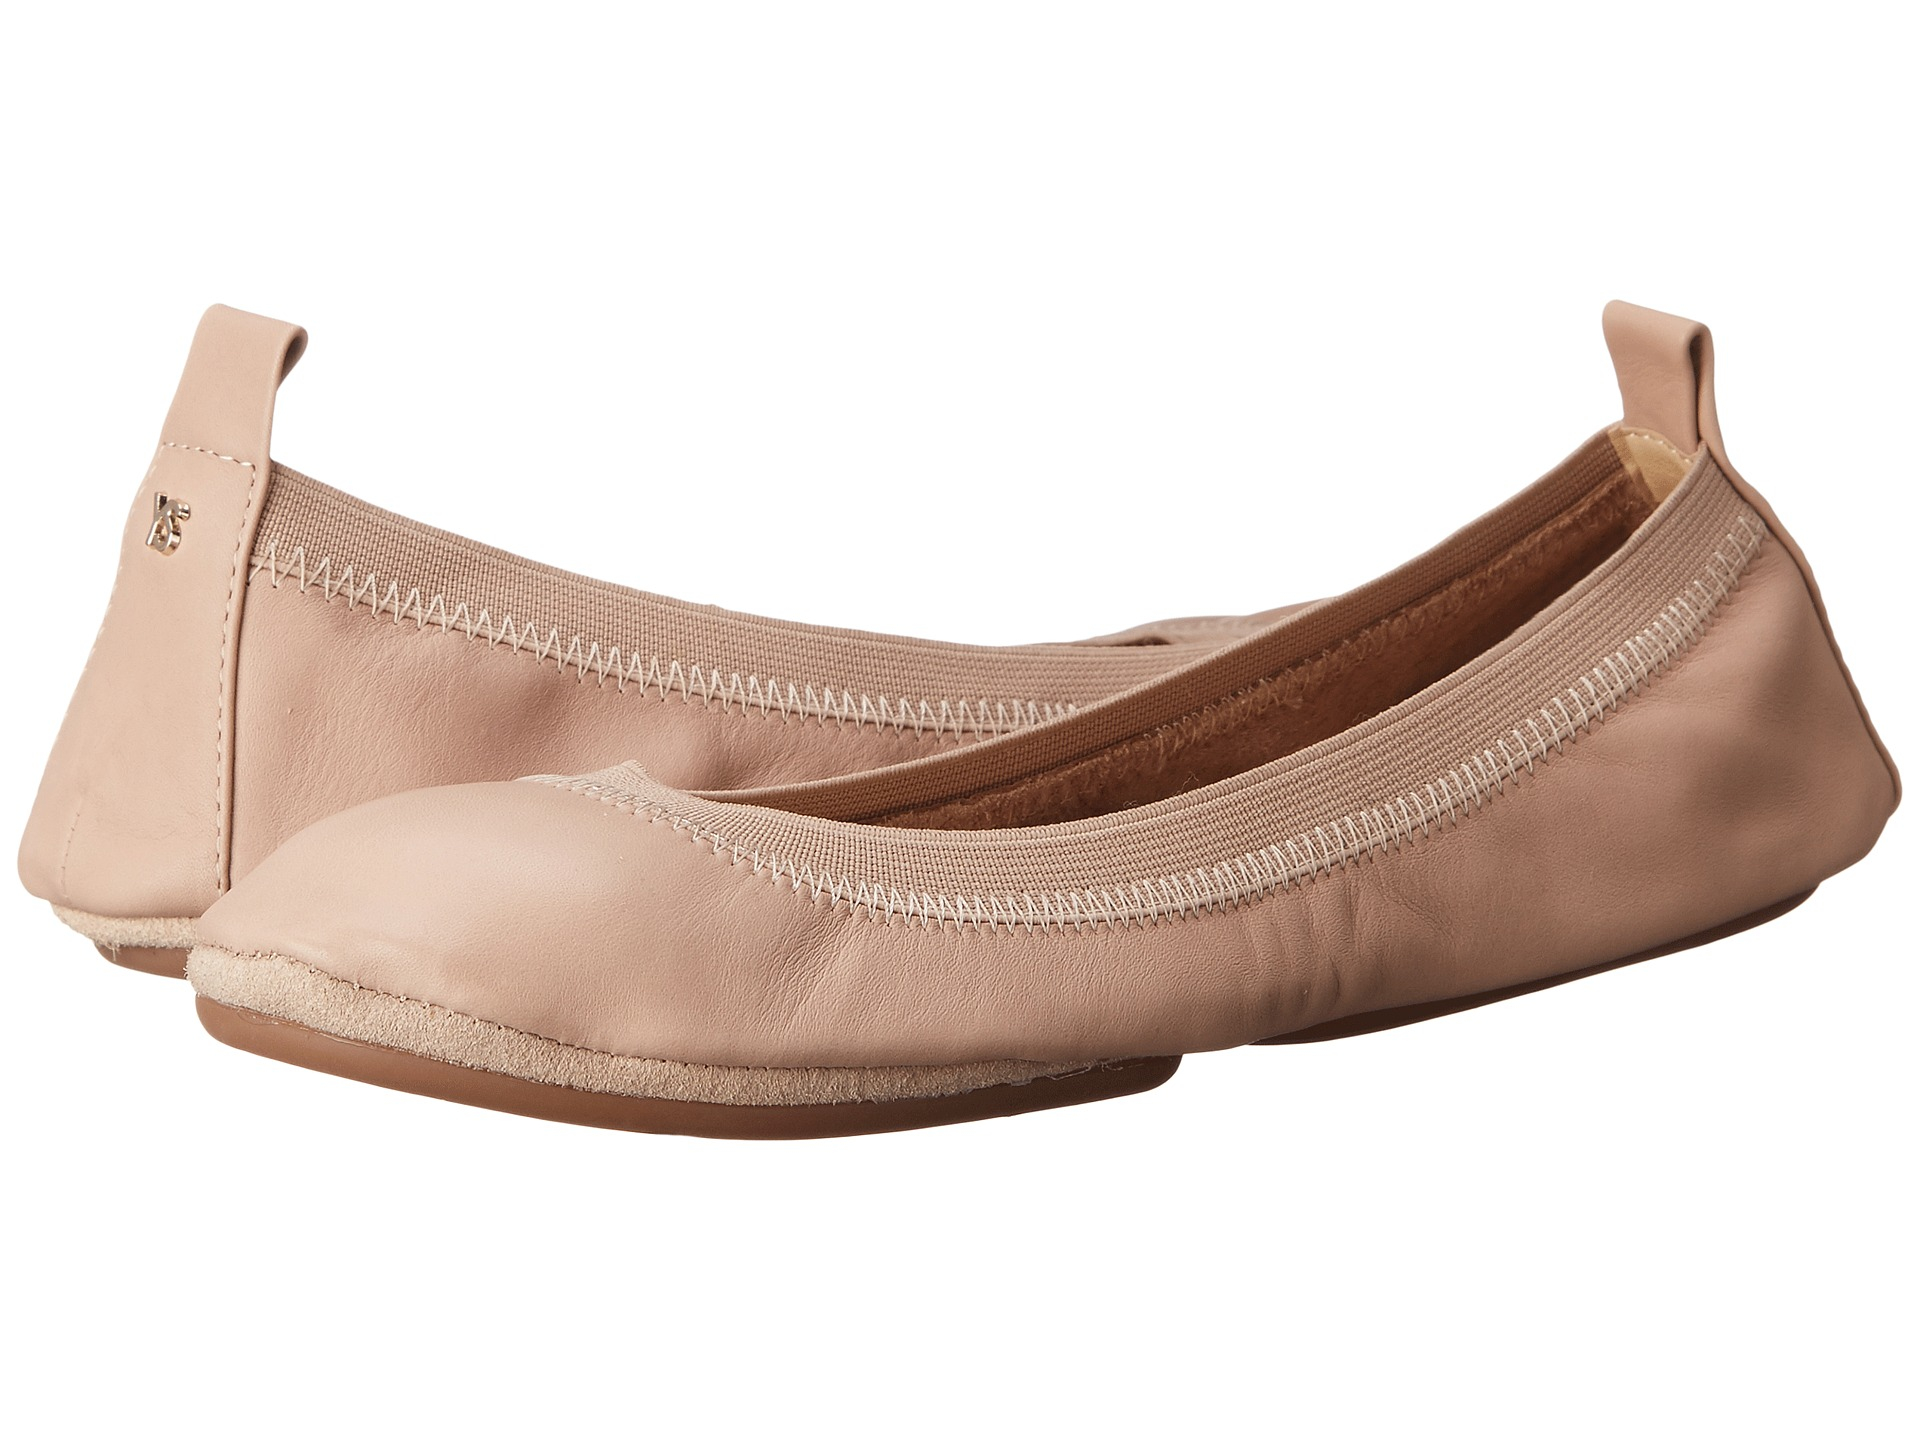 YOSI SAMRA Soft Leather Ballet flats Pink LI62423